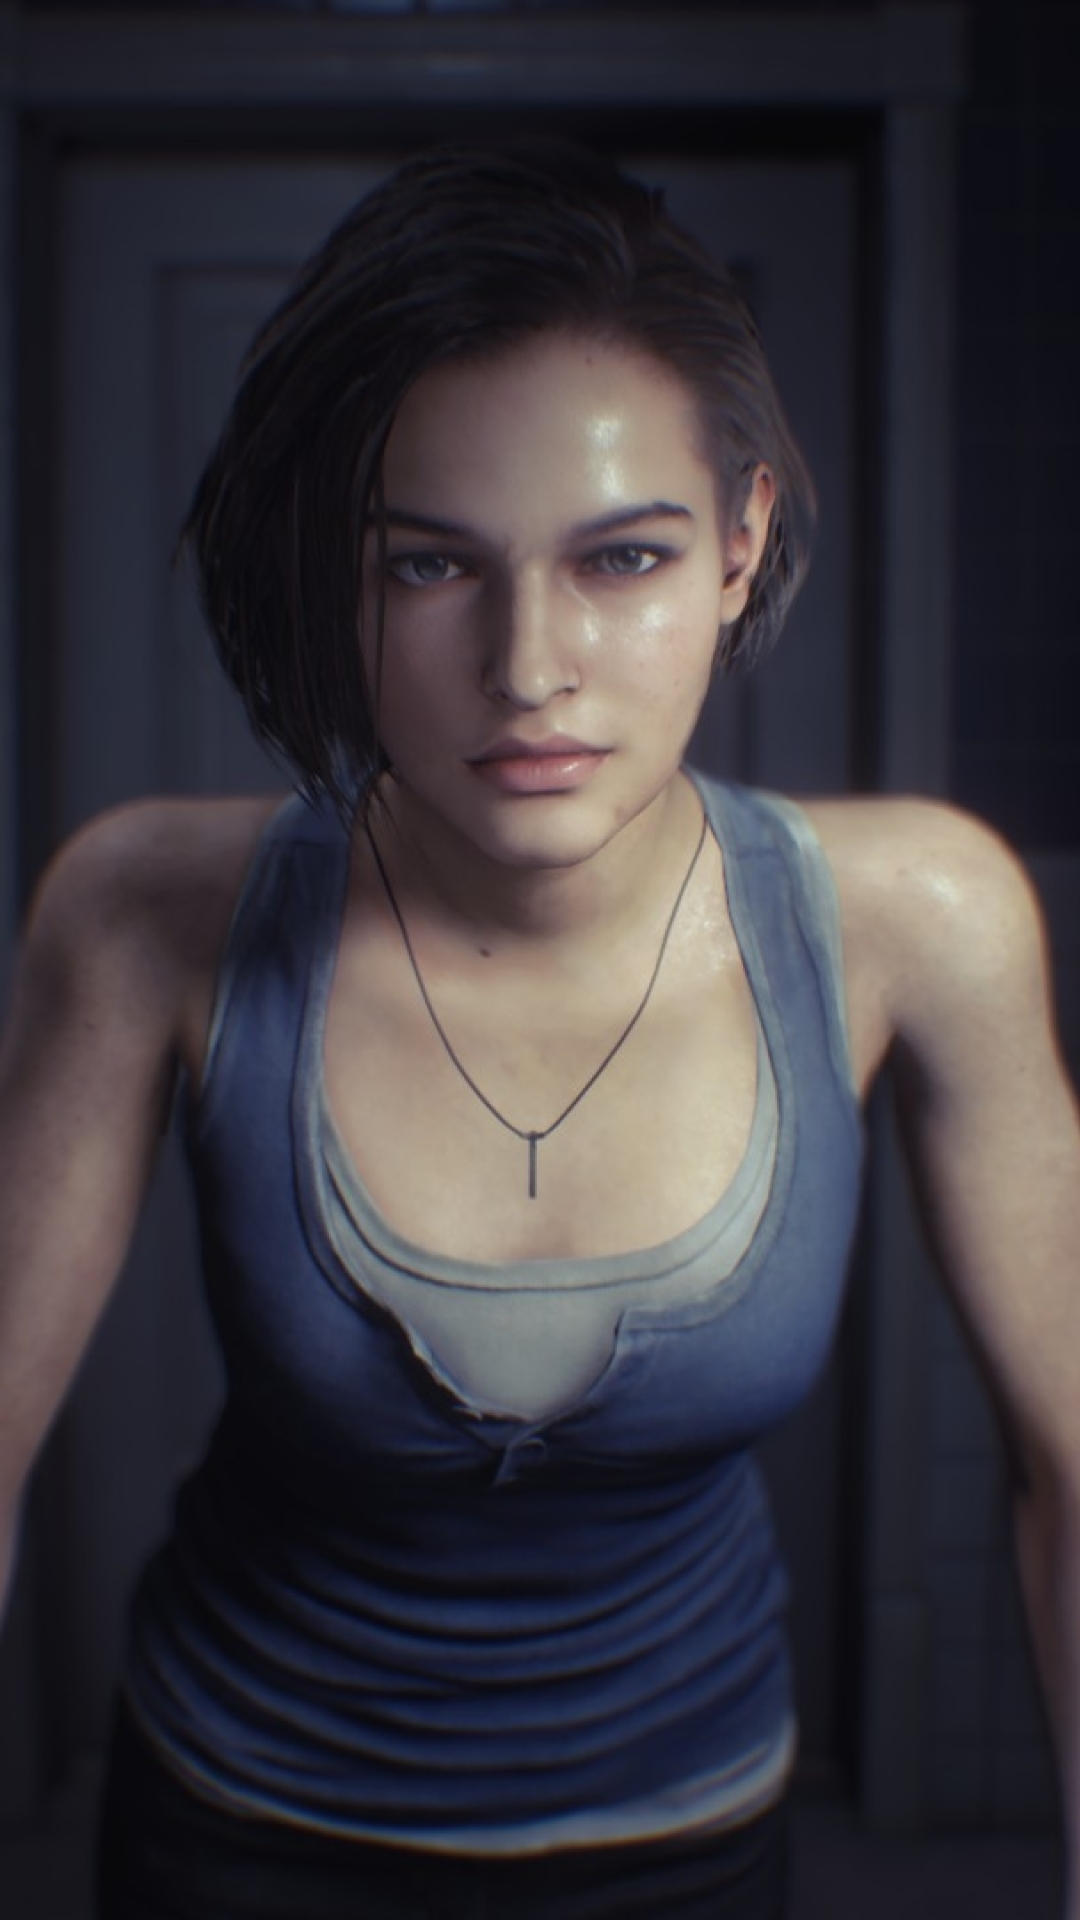 1080x1920 Jill Valentine Resident Evil 3 Remake Iphone 7 6s 6